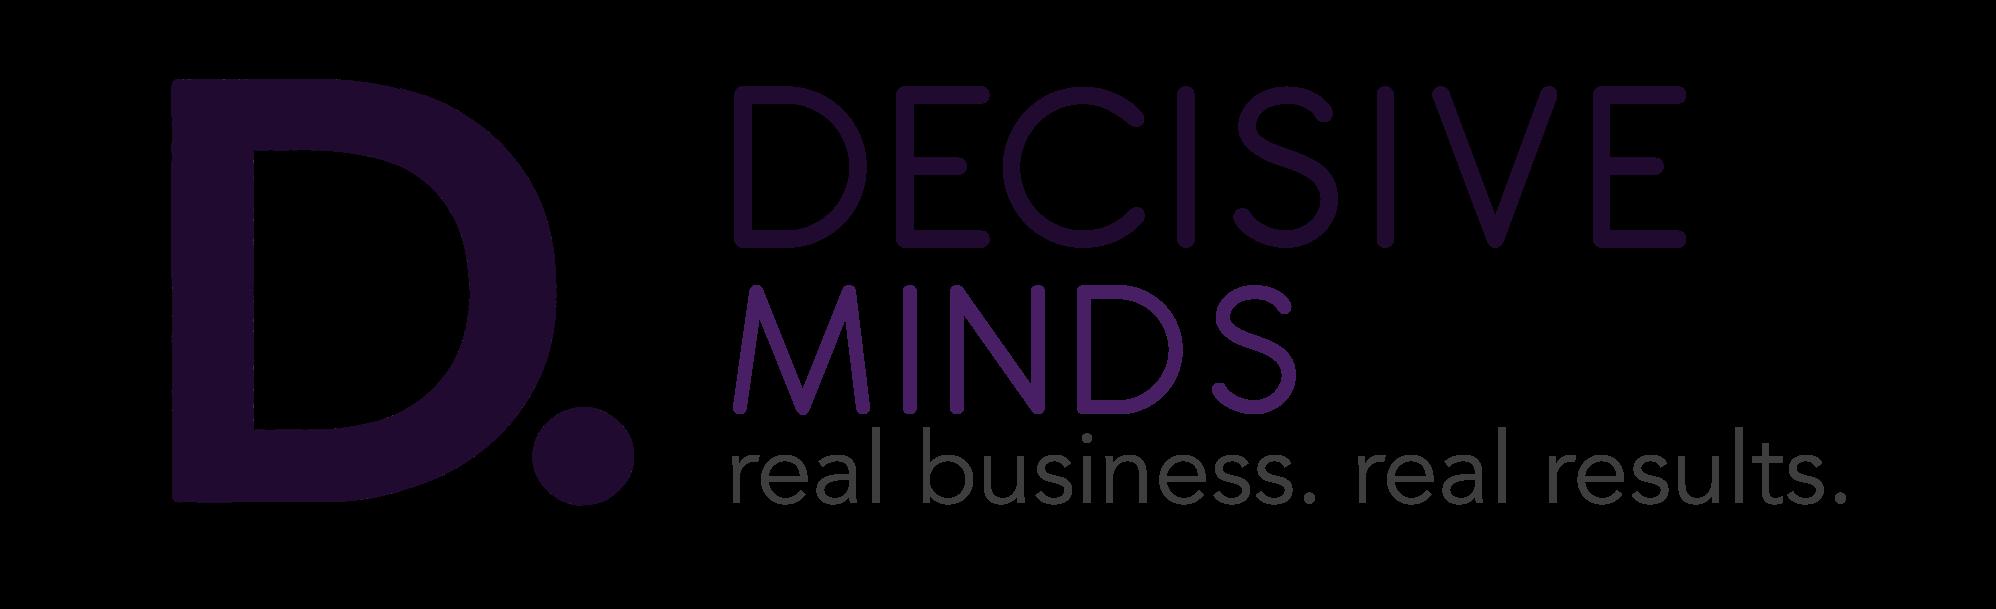 Decisive Minds